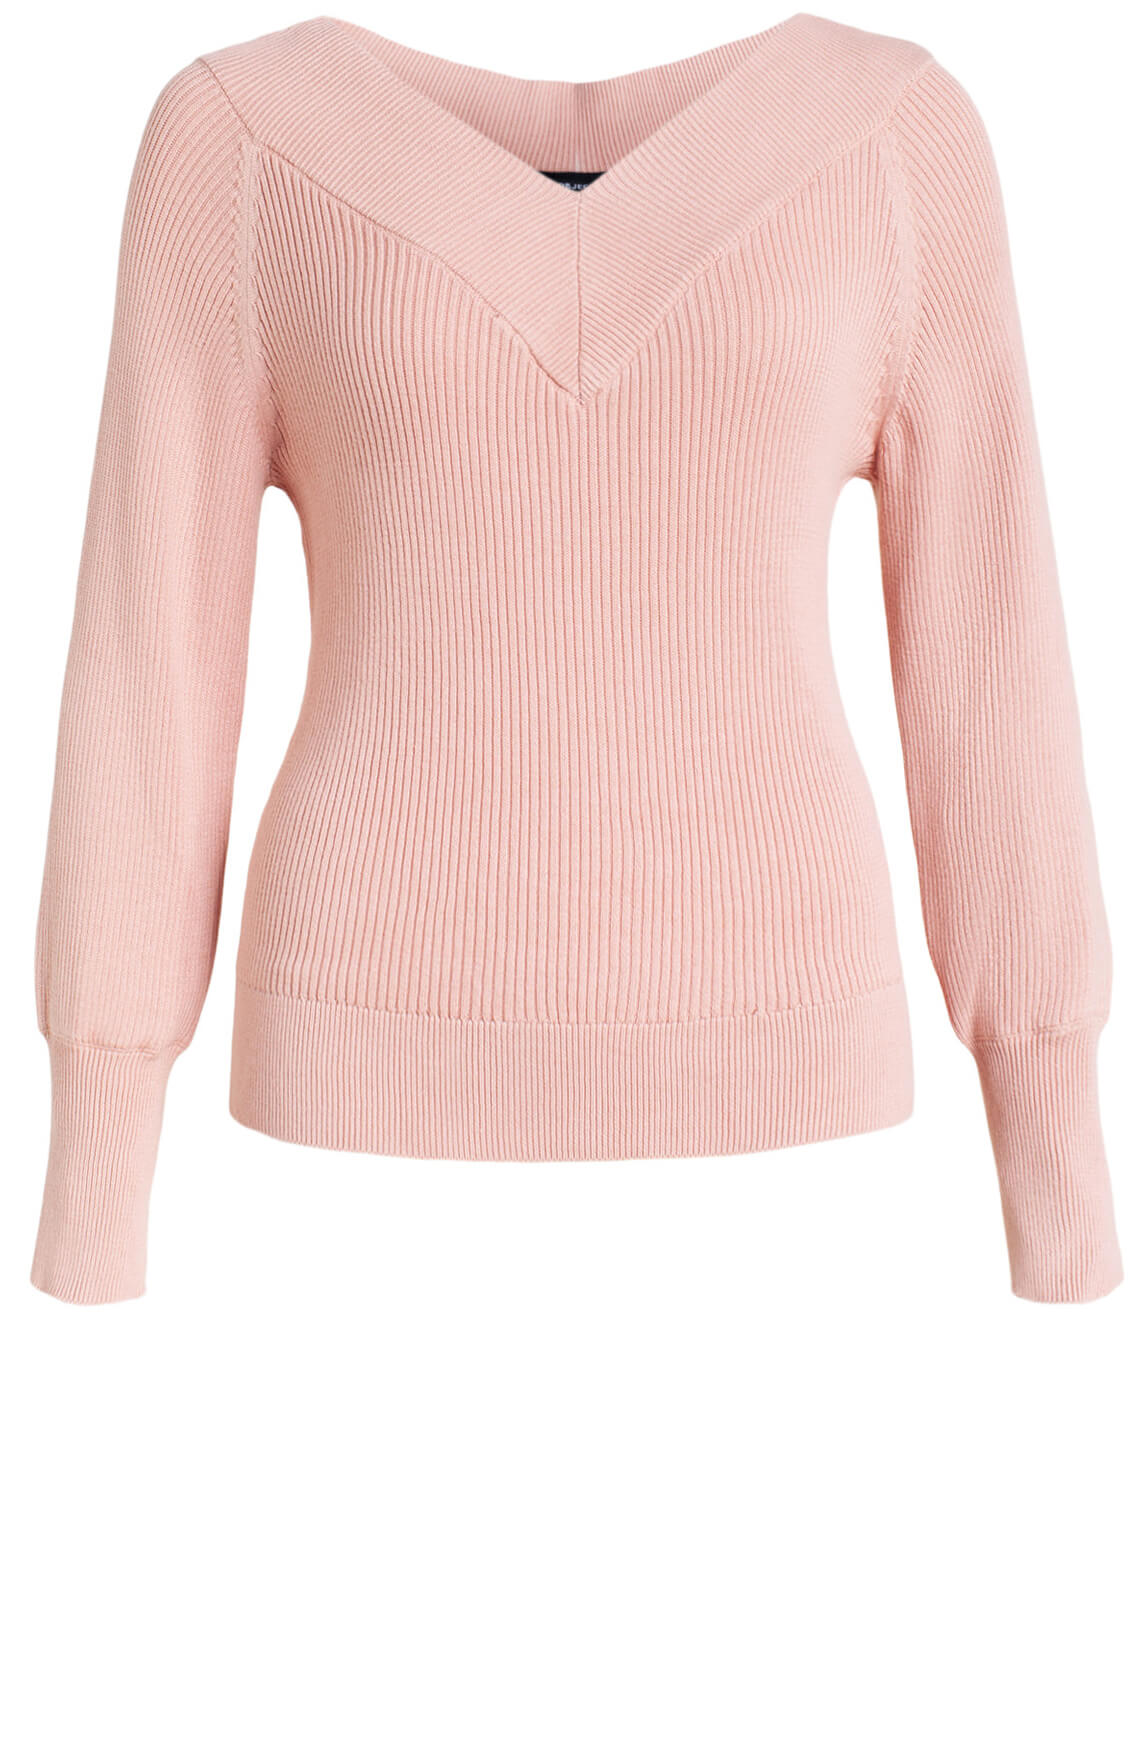 Object Dames Manja pullover roze